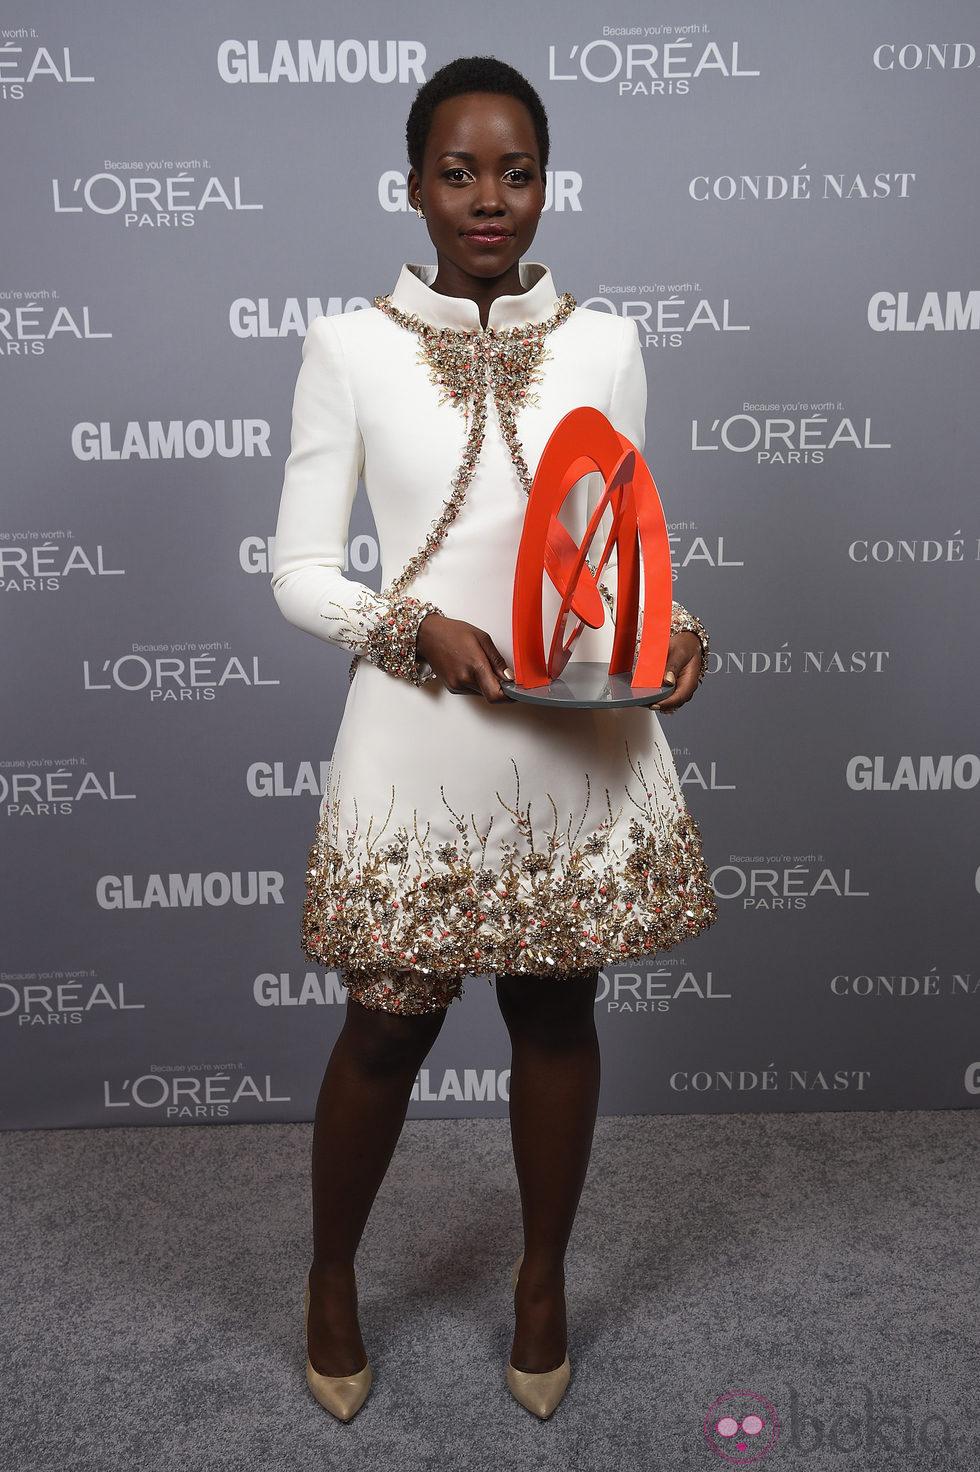 Lupita Nyong'o en la entrega de los Glamour Women Of The Year Awards 2014